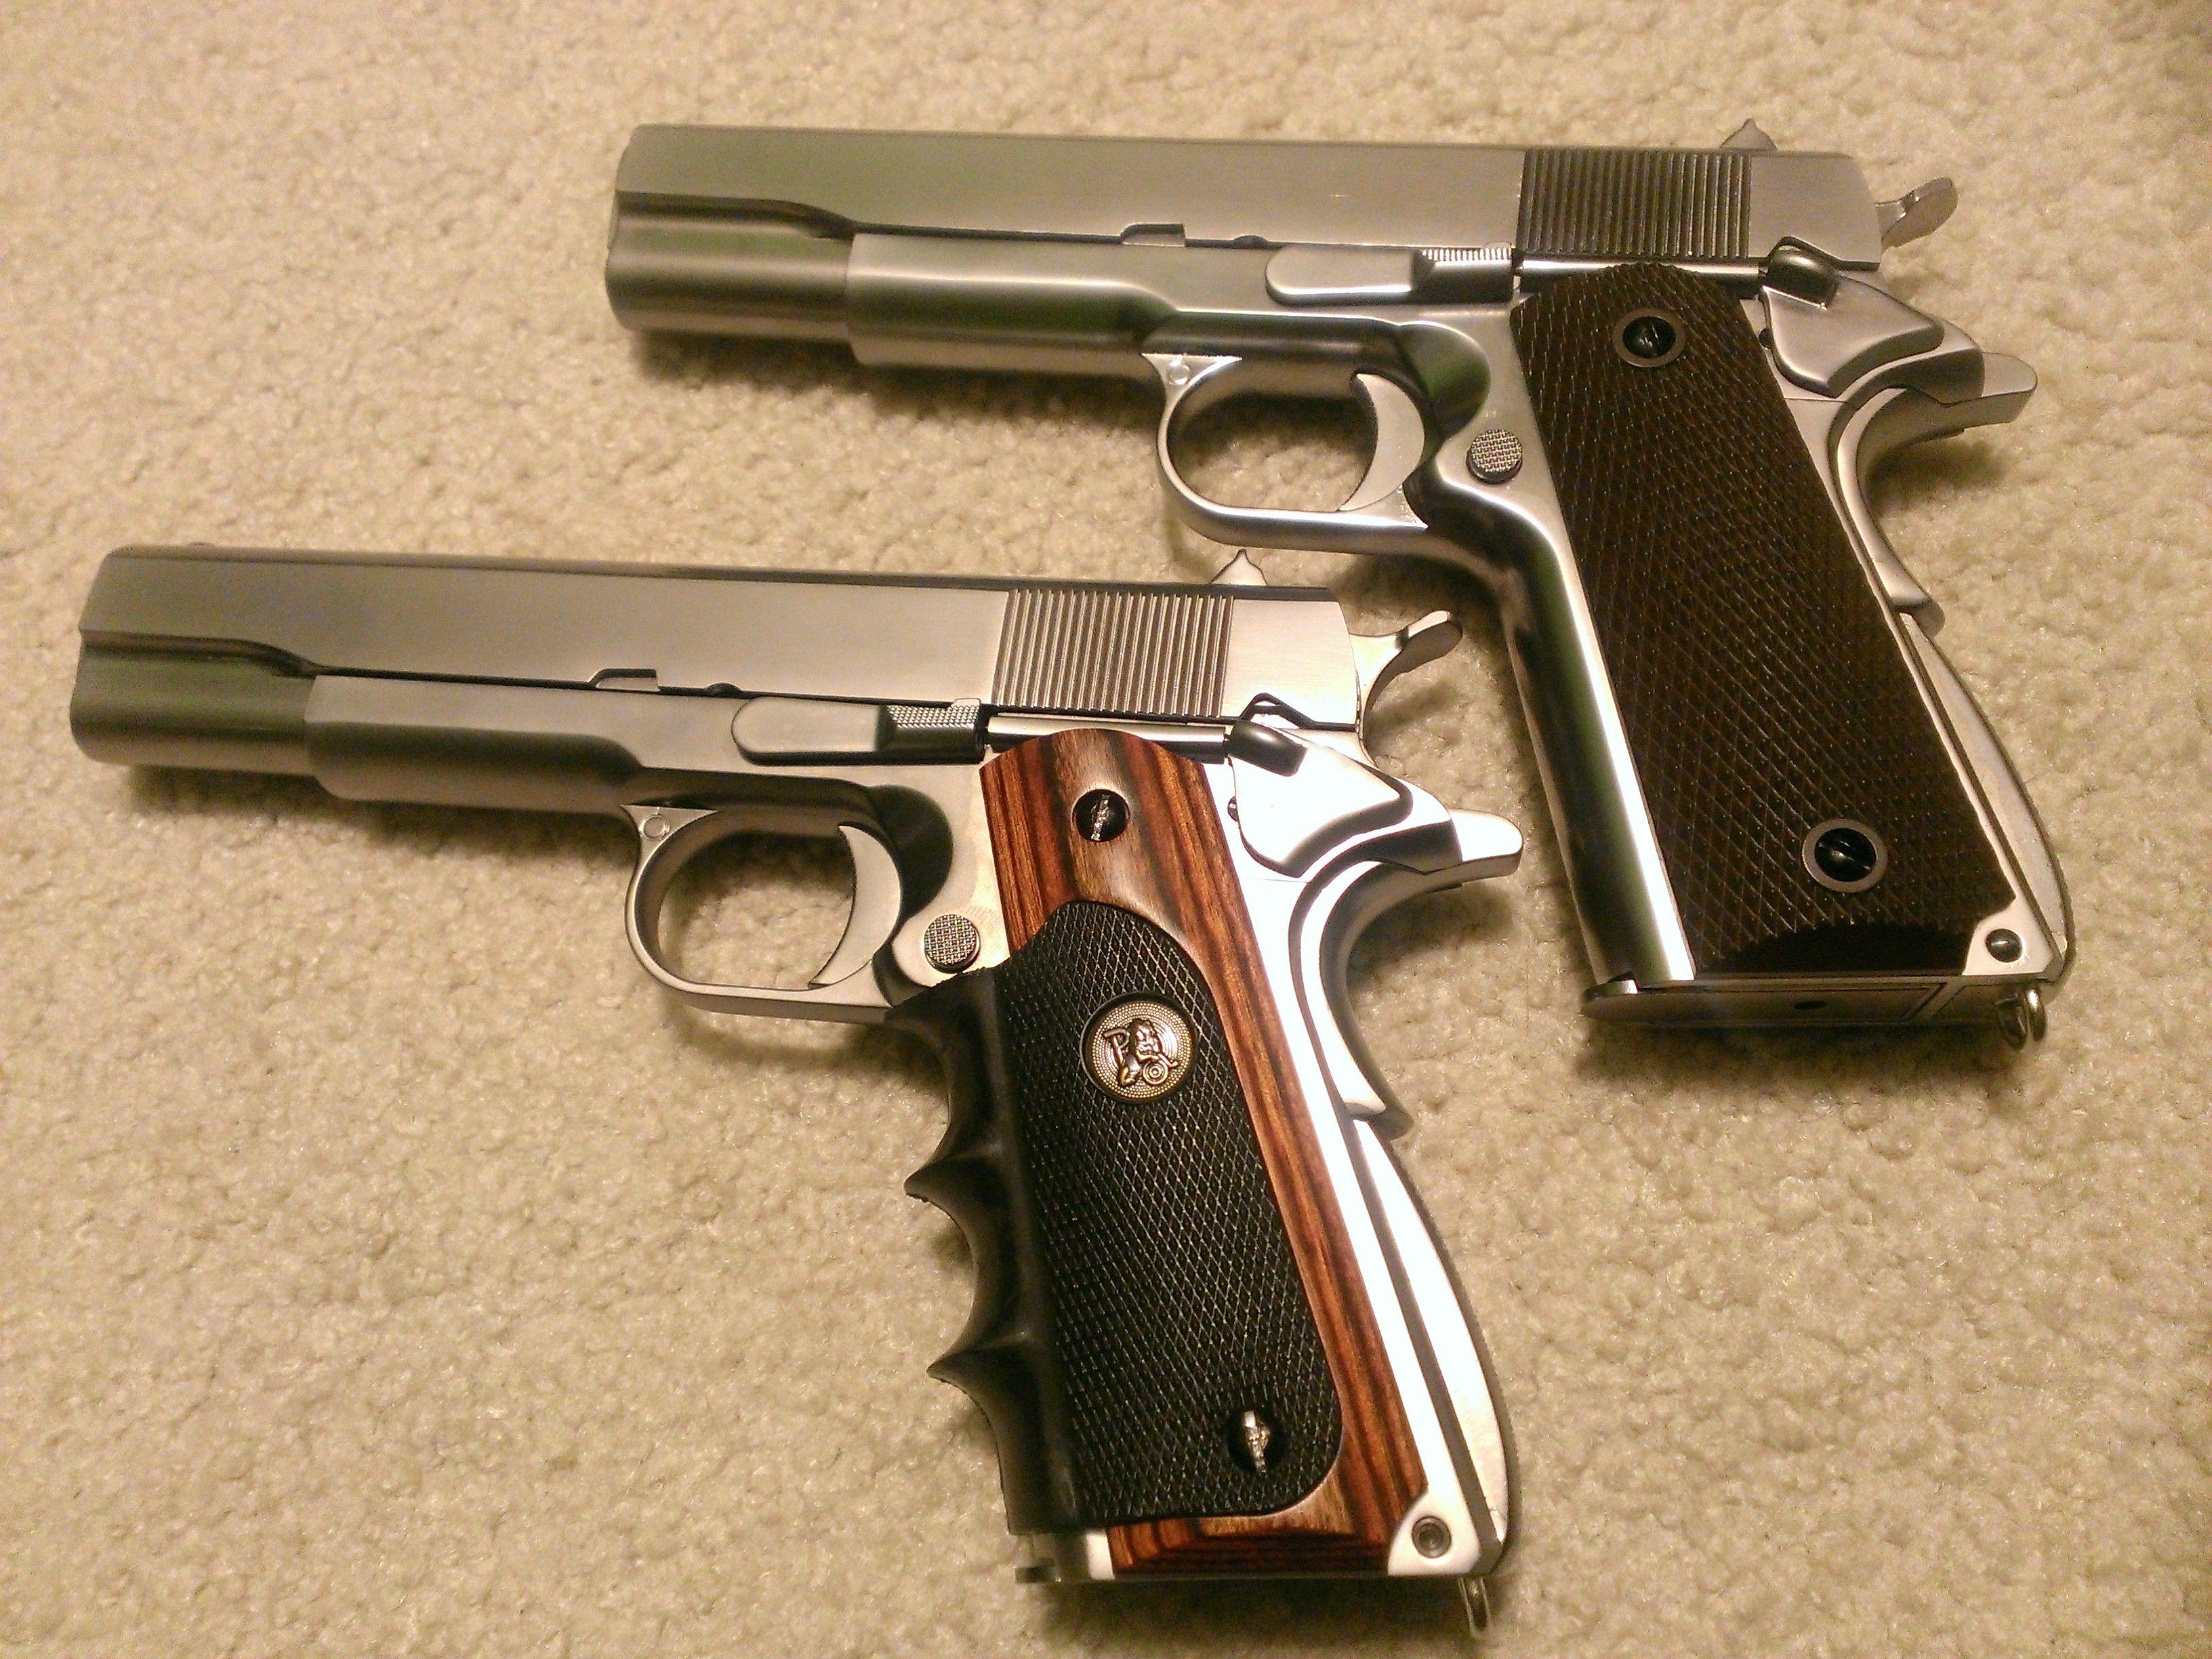 Diy Hitman Guns W Case R Diy Guns Hand Guns Hitman